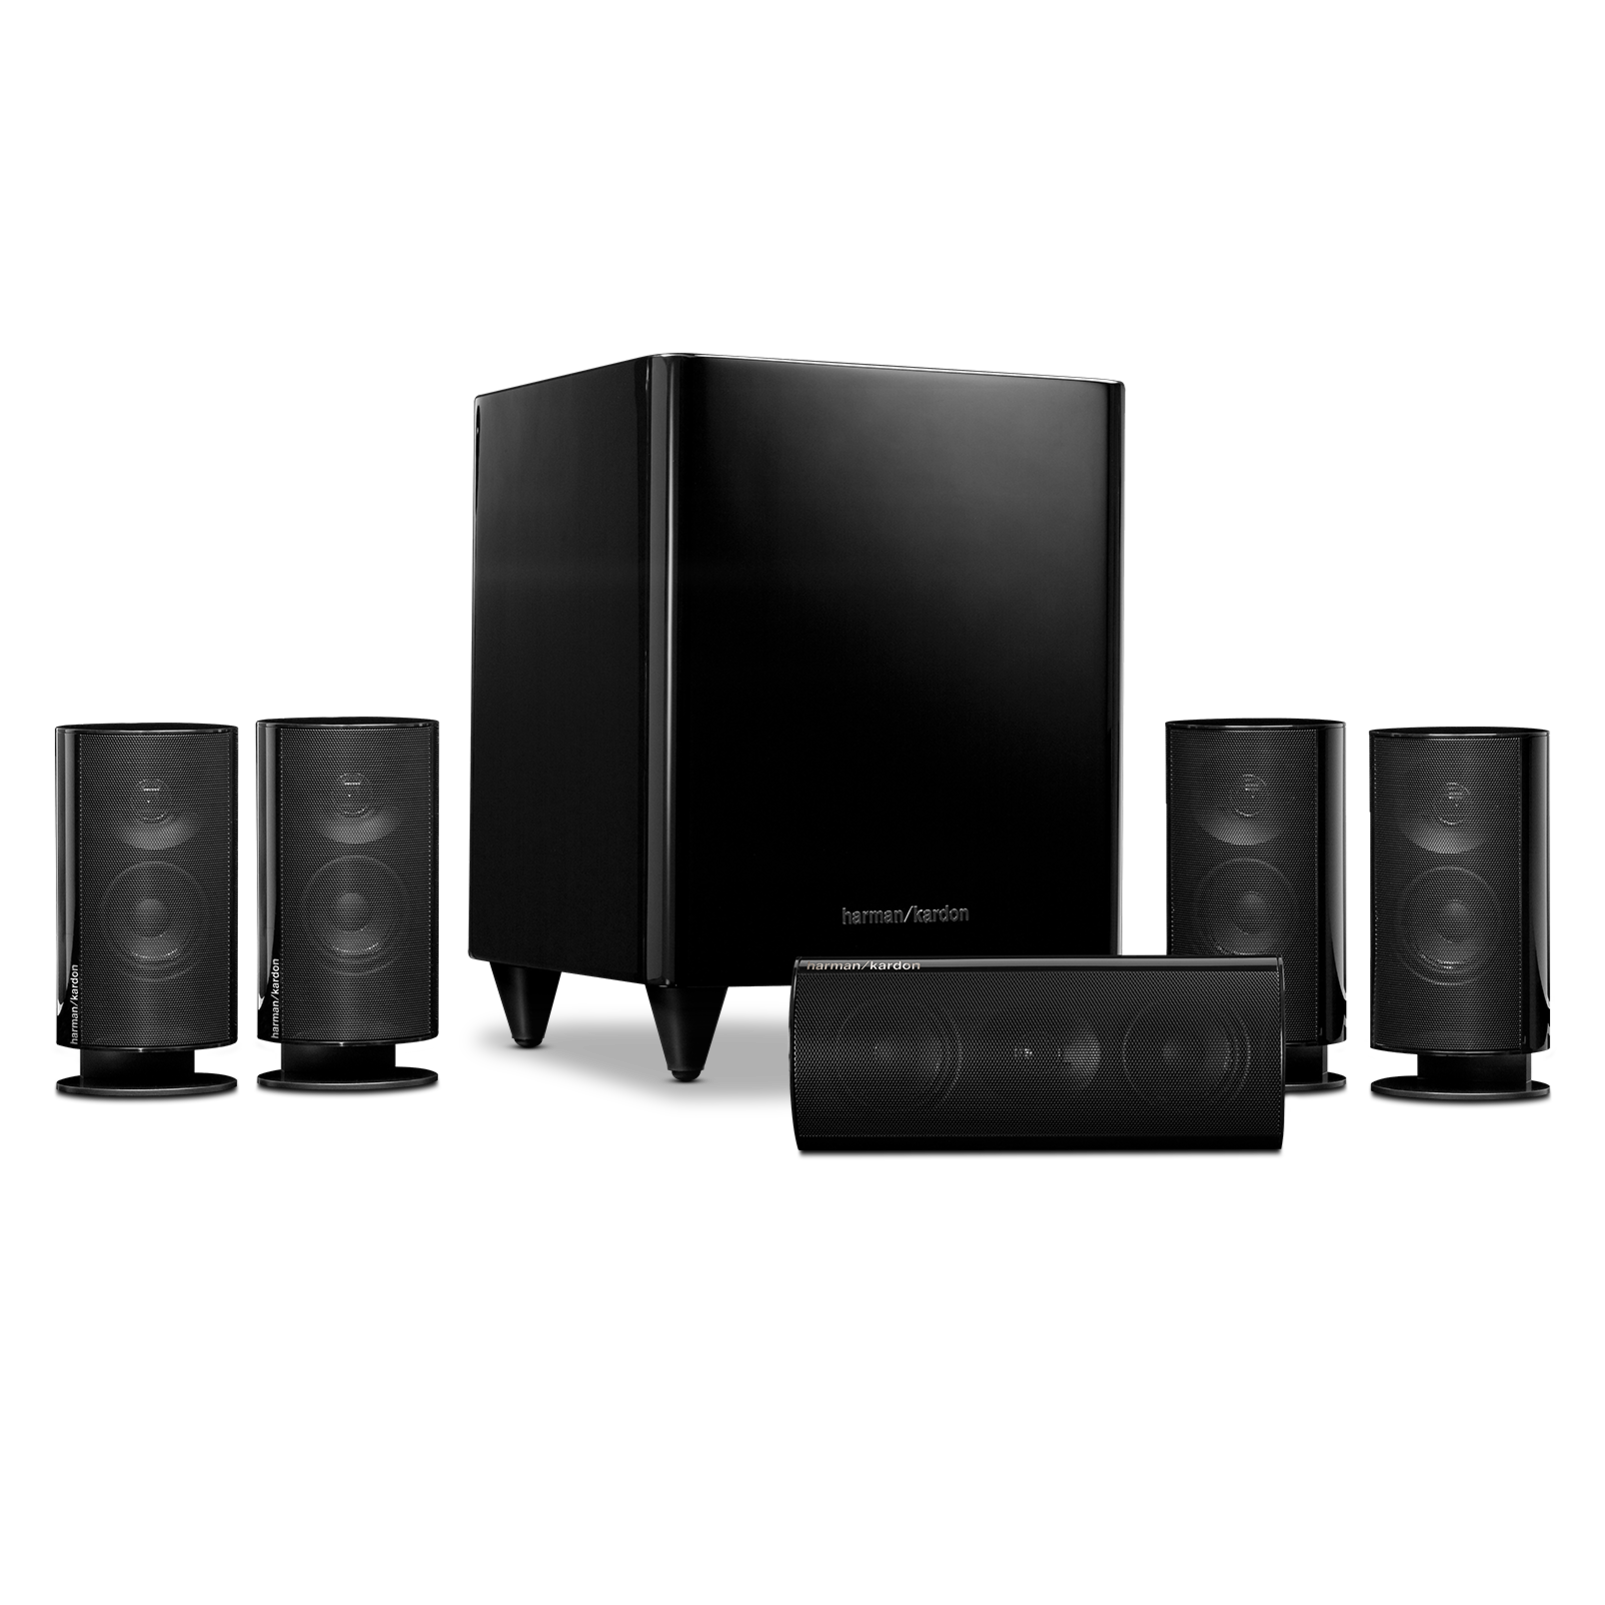 Harman Kardon HKTS 20 5.1 Home Theater Speaker System Refurbished $169.99 + Free Shipping